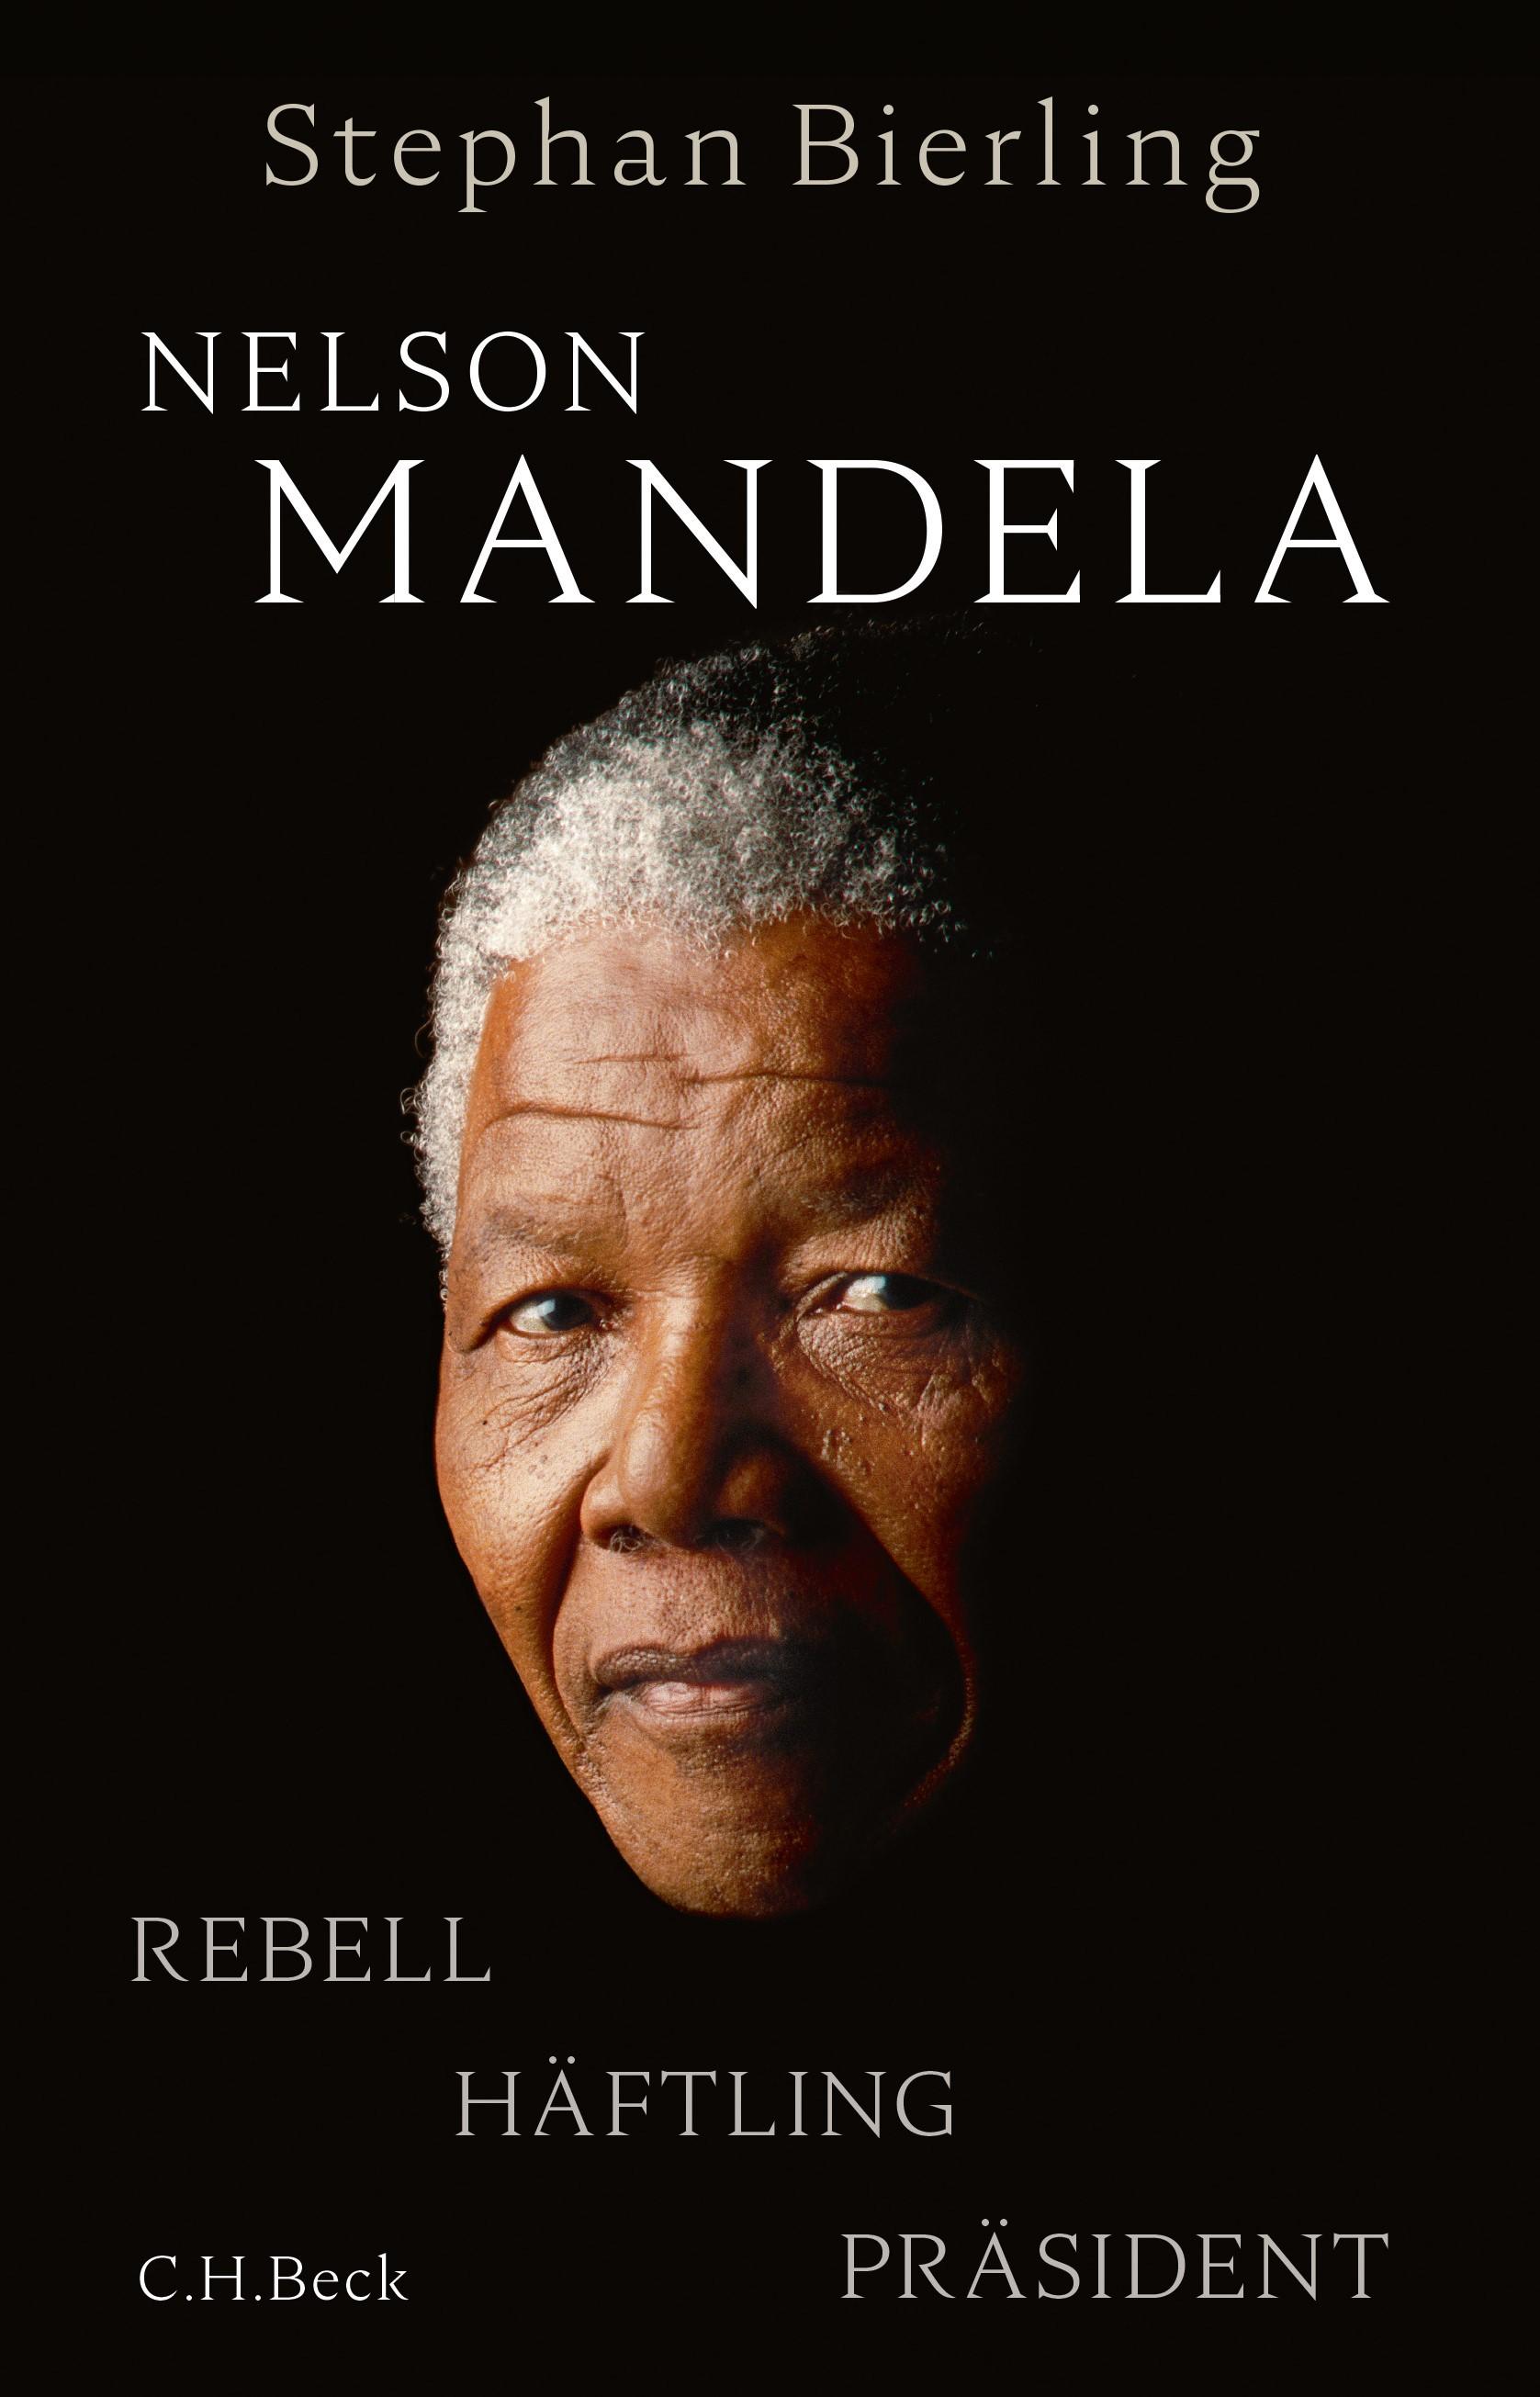 Nelson Mandela | Bierling, Stephan, 2018 | Buch (Cover)